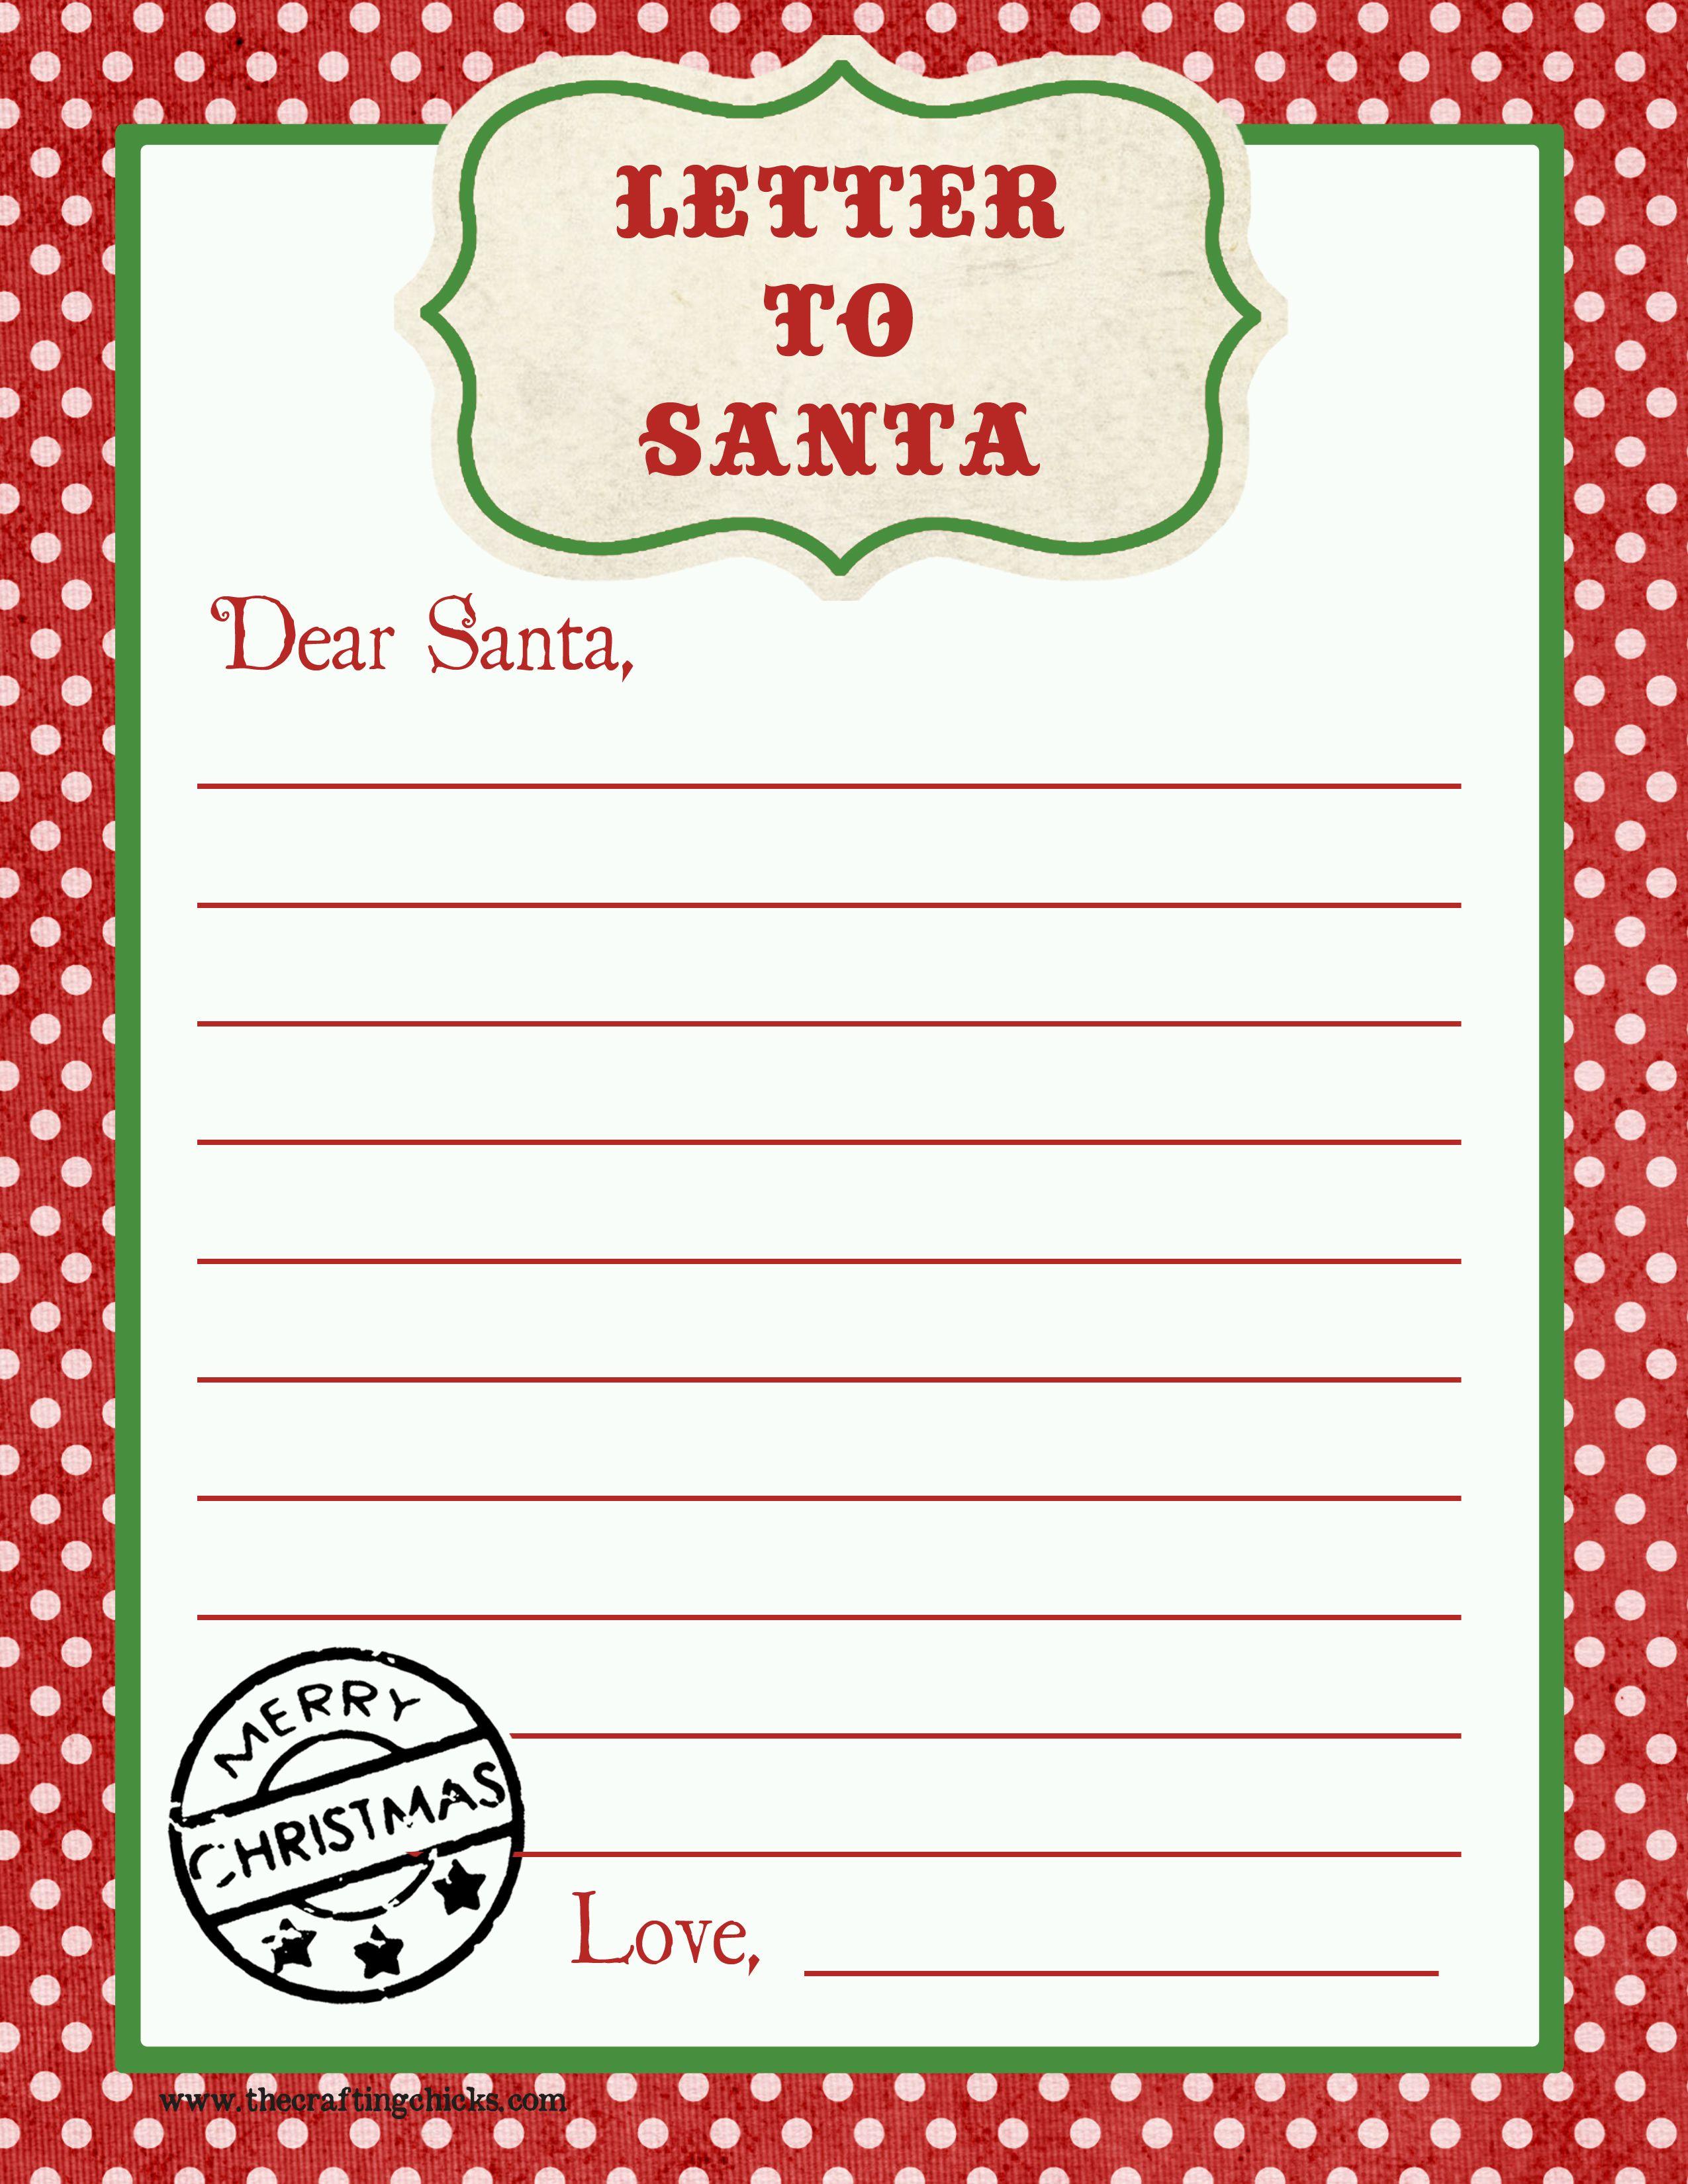 Letter to Santa Free Printable Download Free printable